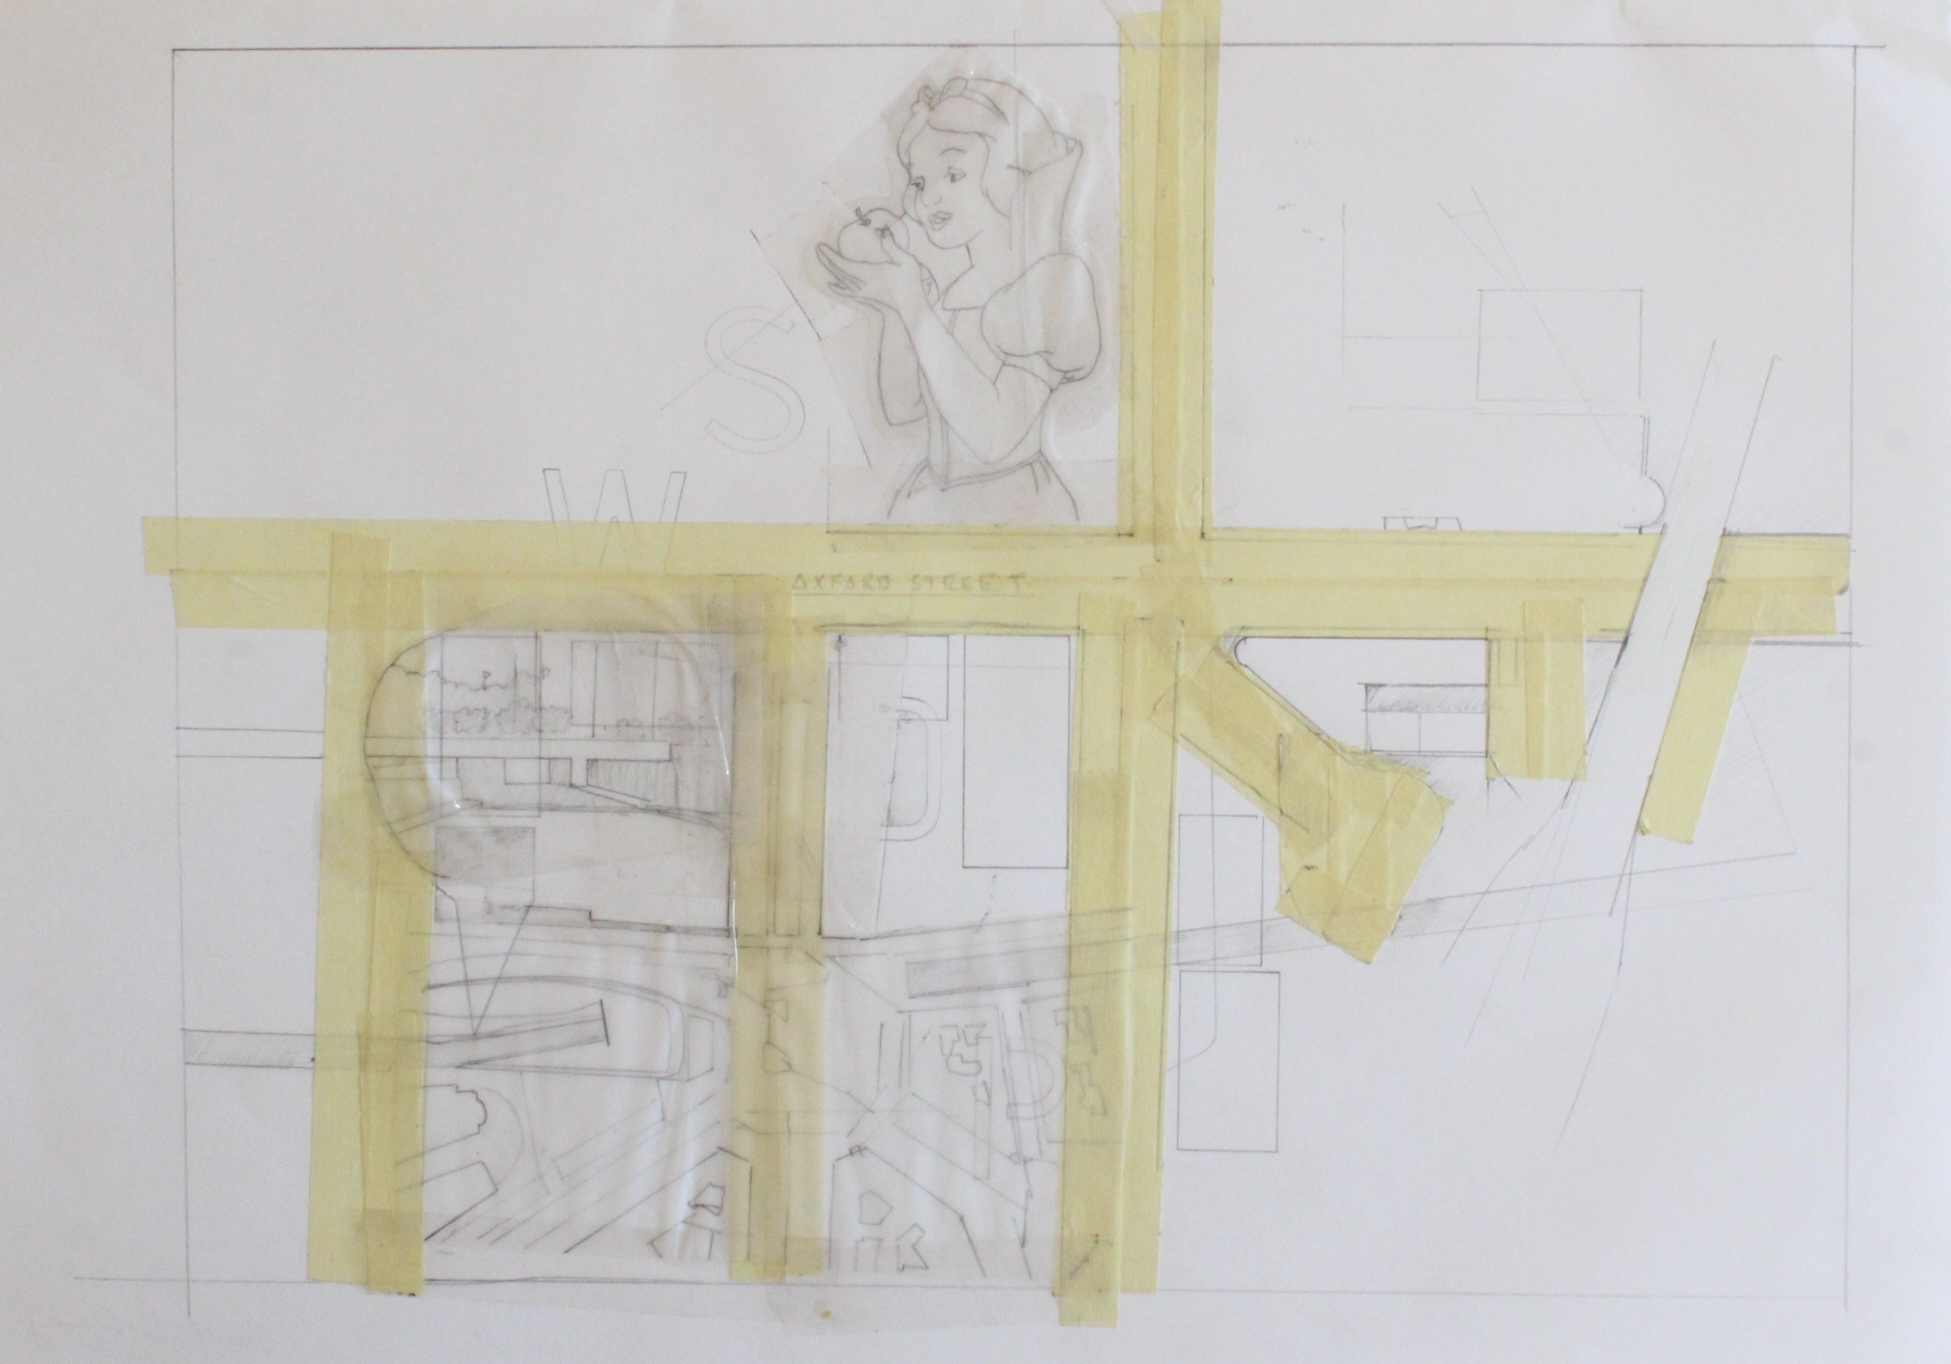 "'david clark - 9' - 11.5"" x 16.5"" - collage - $275"